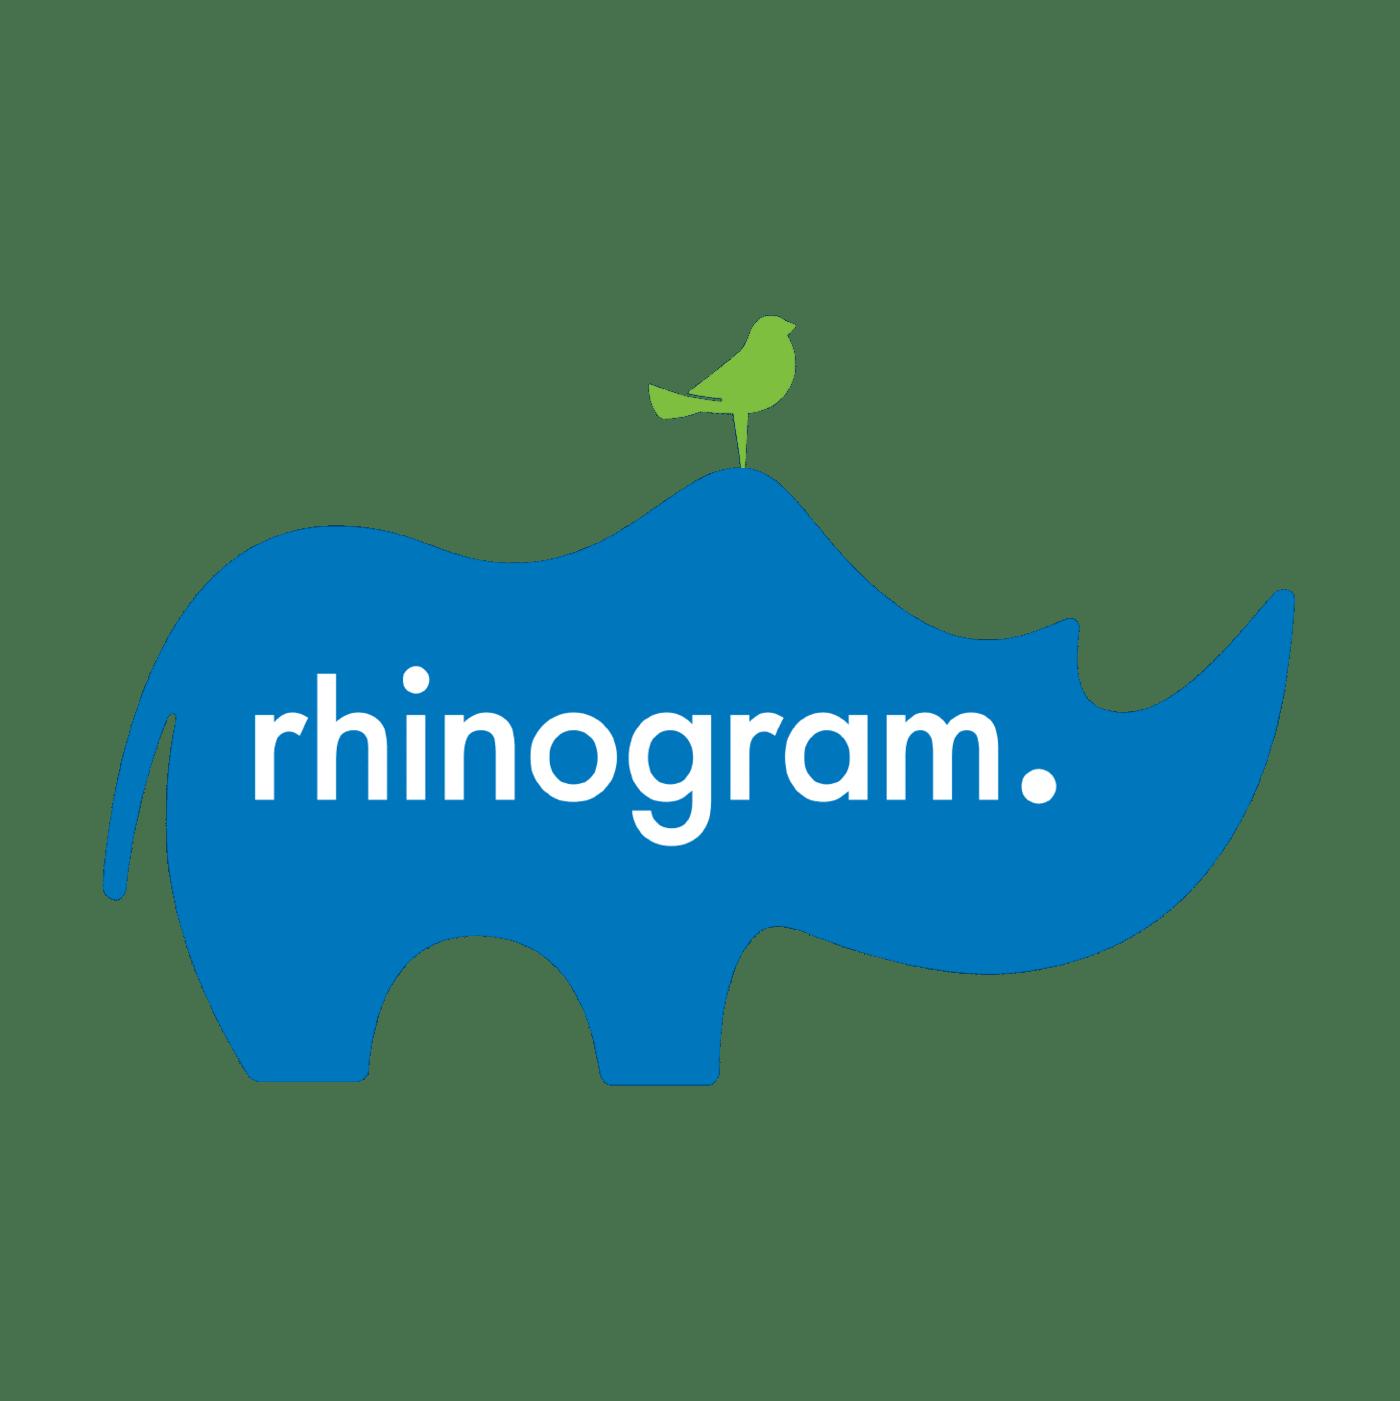 Rhinogram